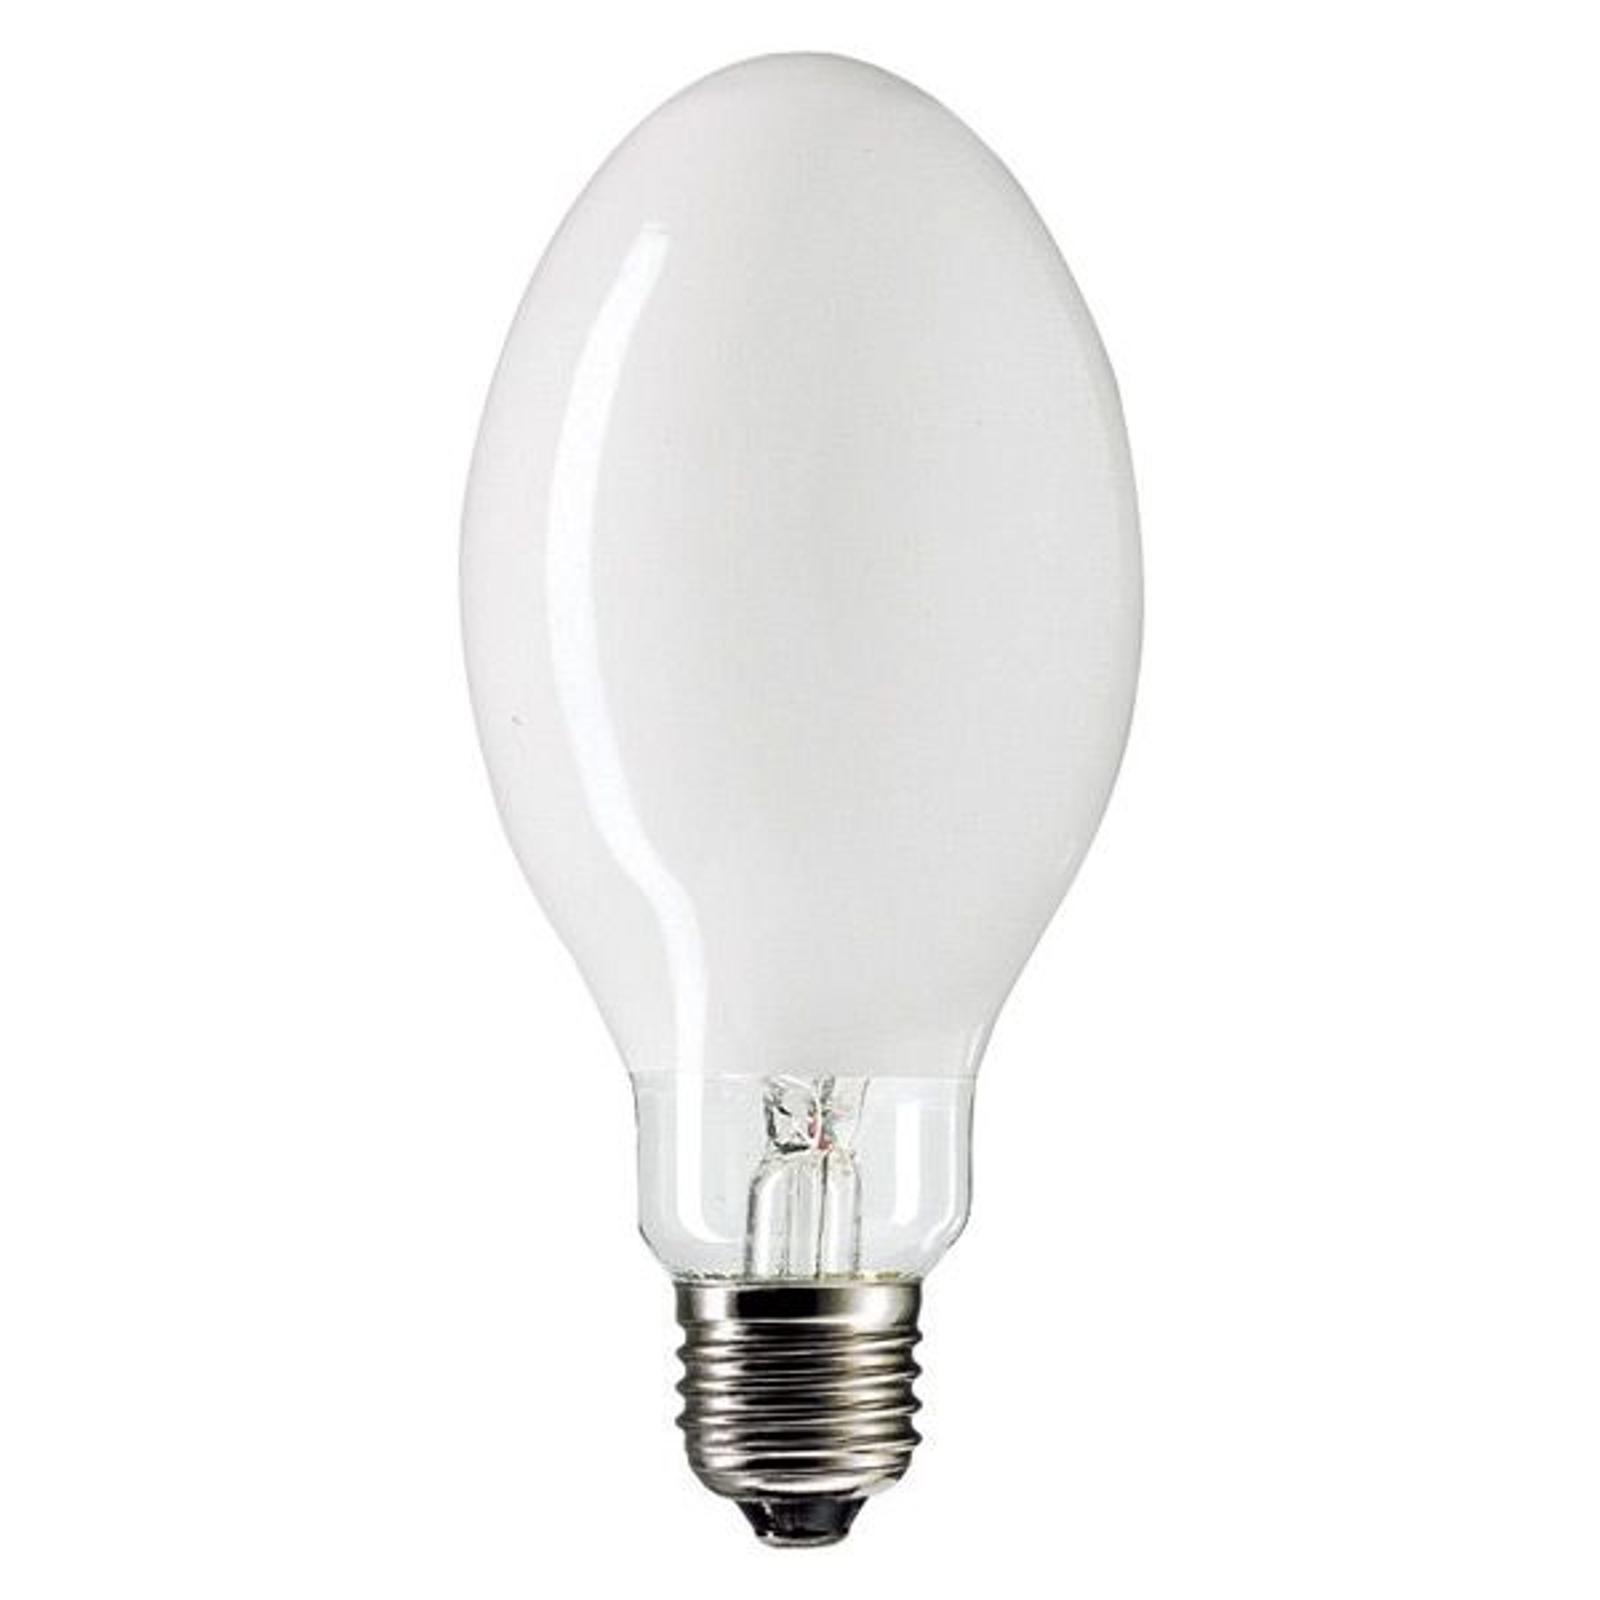 E40 100W 828 Metallhalogendampflampe Master CDO-ET